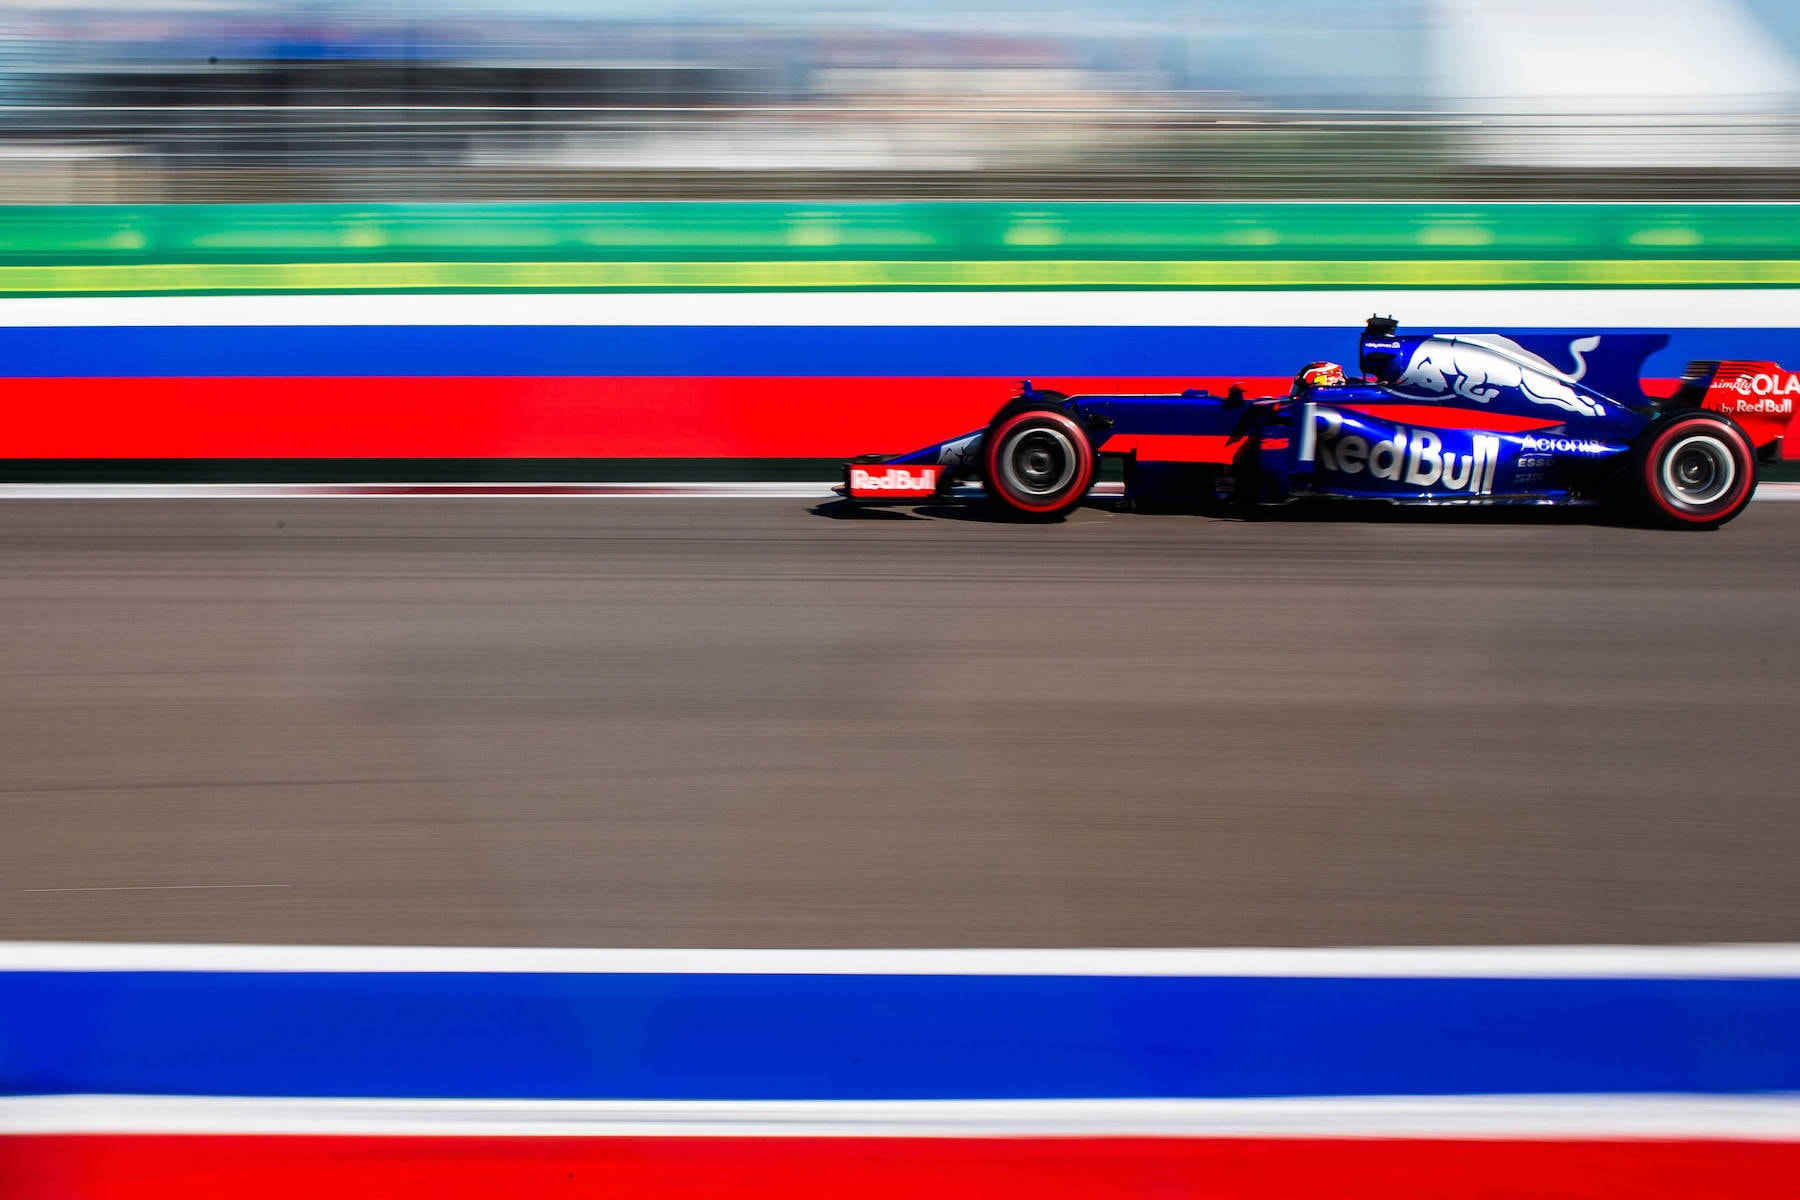 2017 Daniil Kvyat | Toro Rosso STR12 | 2017 Russian GP Q2 2 copy.jpg